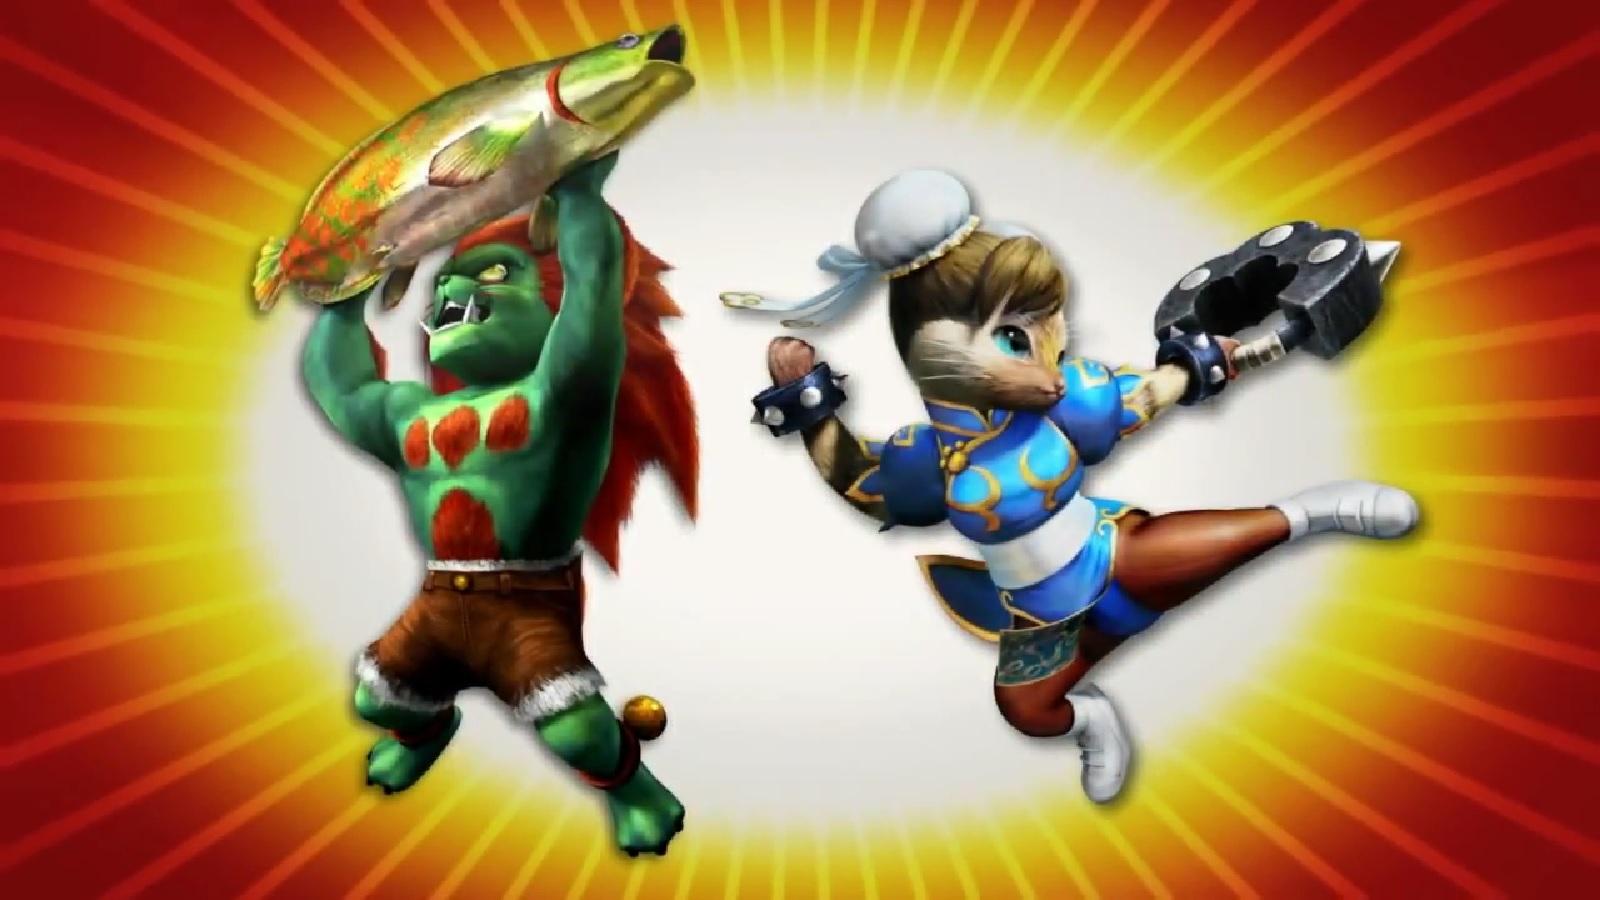 Free Download Monster Hunter 4 Wallpapers In Hd Gamingboltcom